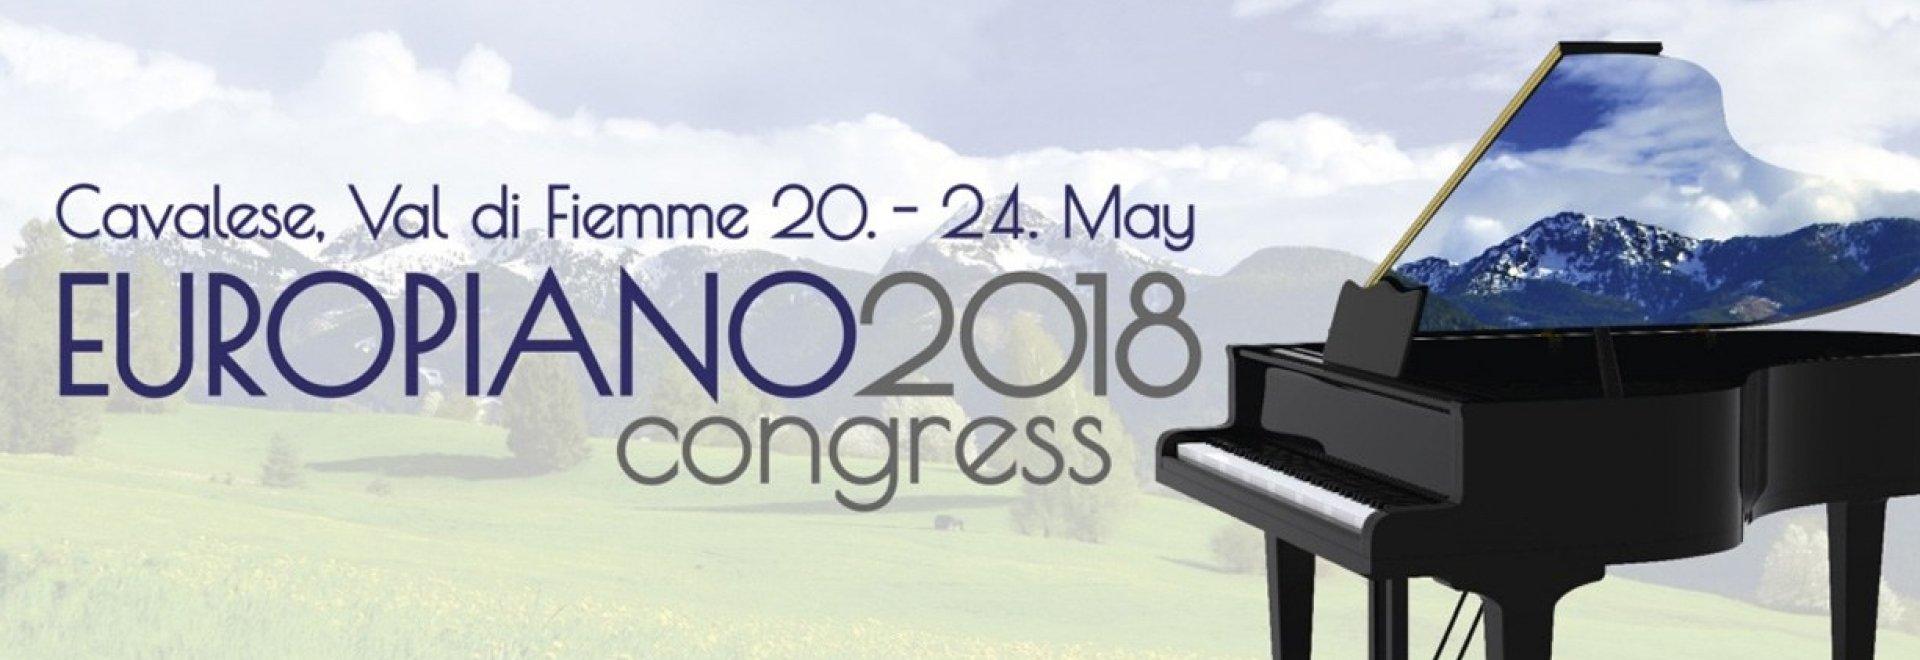 Europiano Congress - May 2018